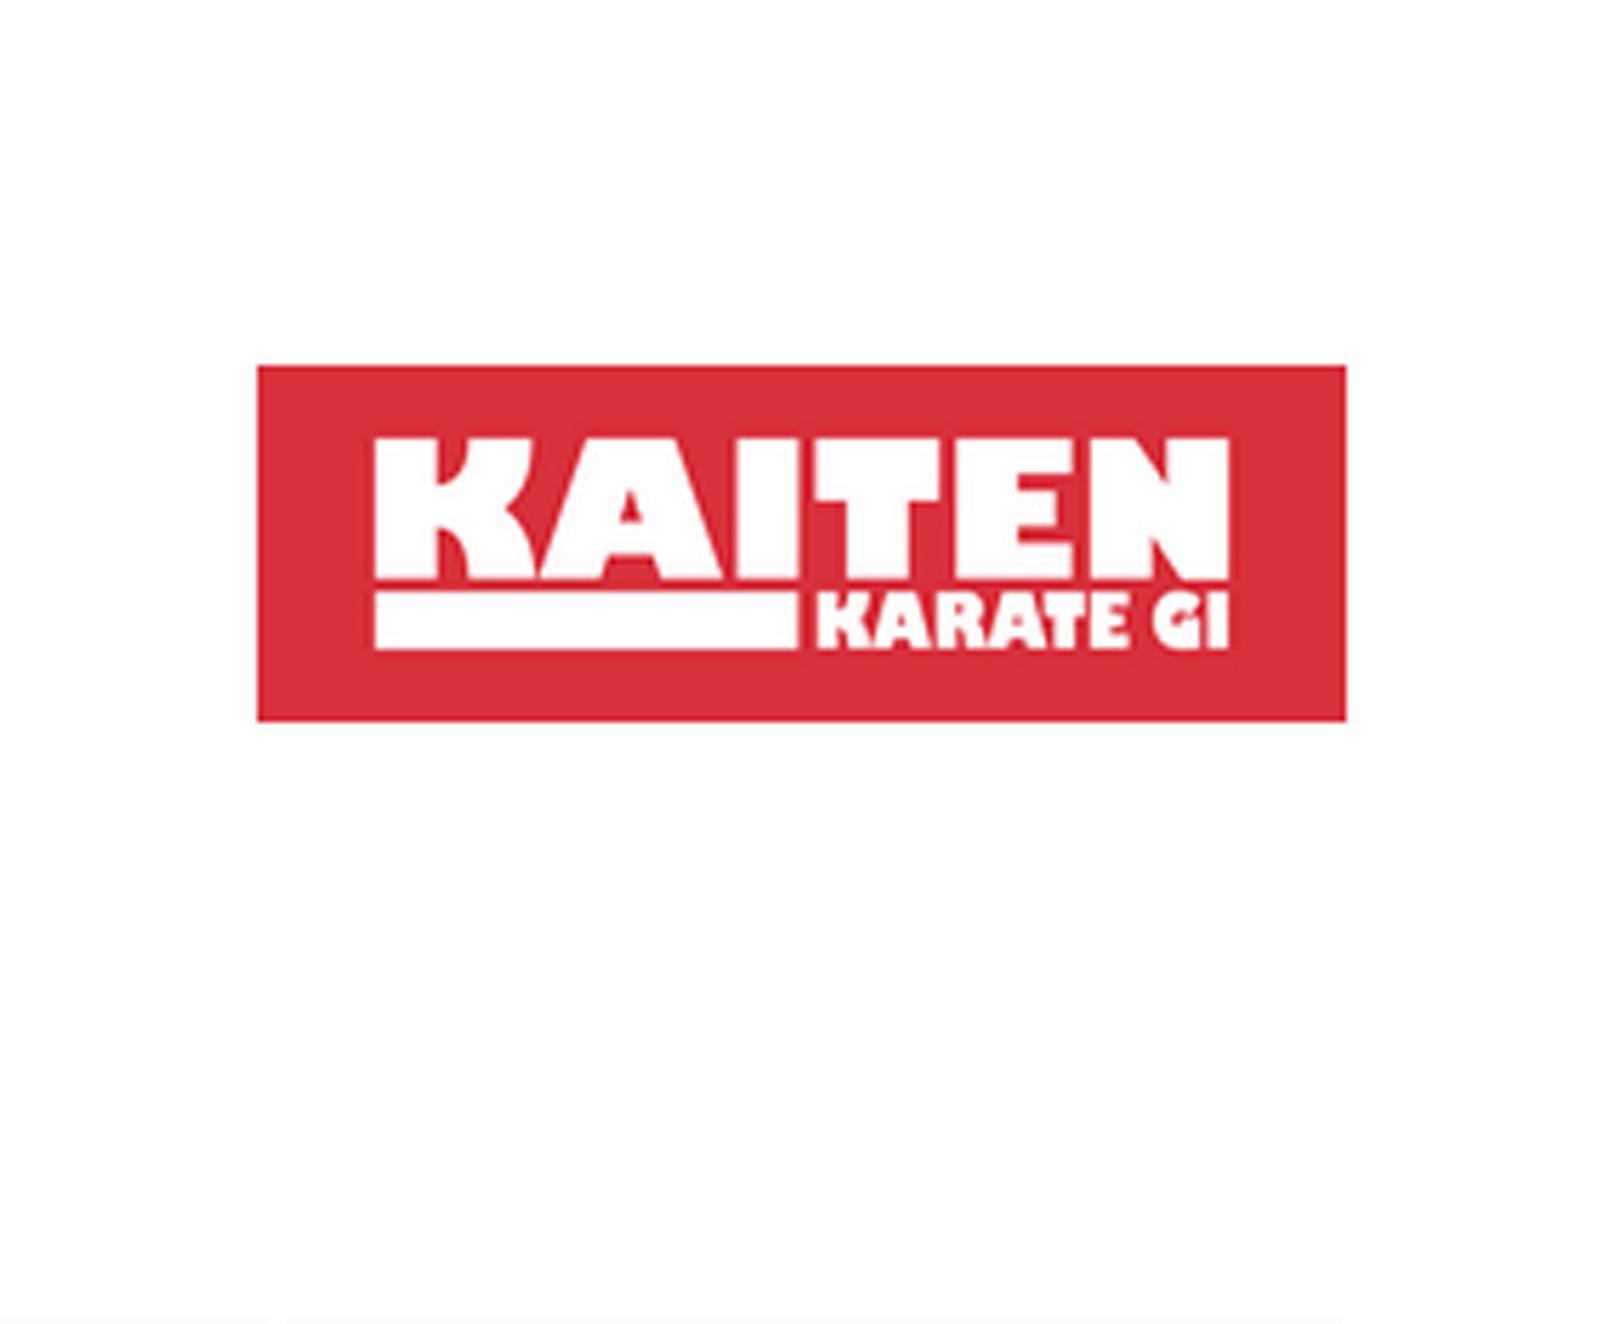 KAITEN Eco Karateanzug universal